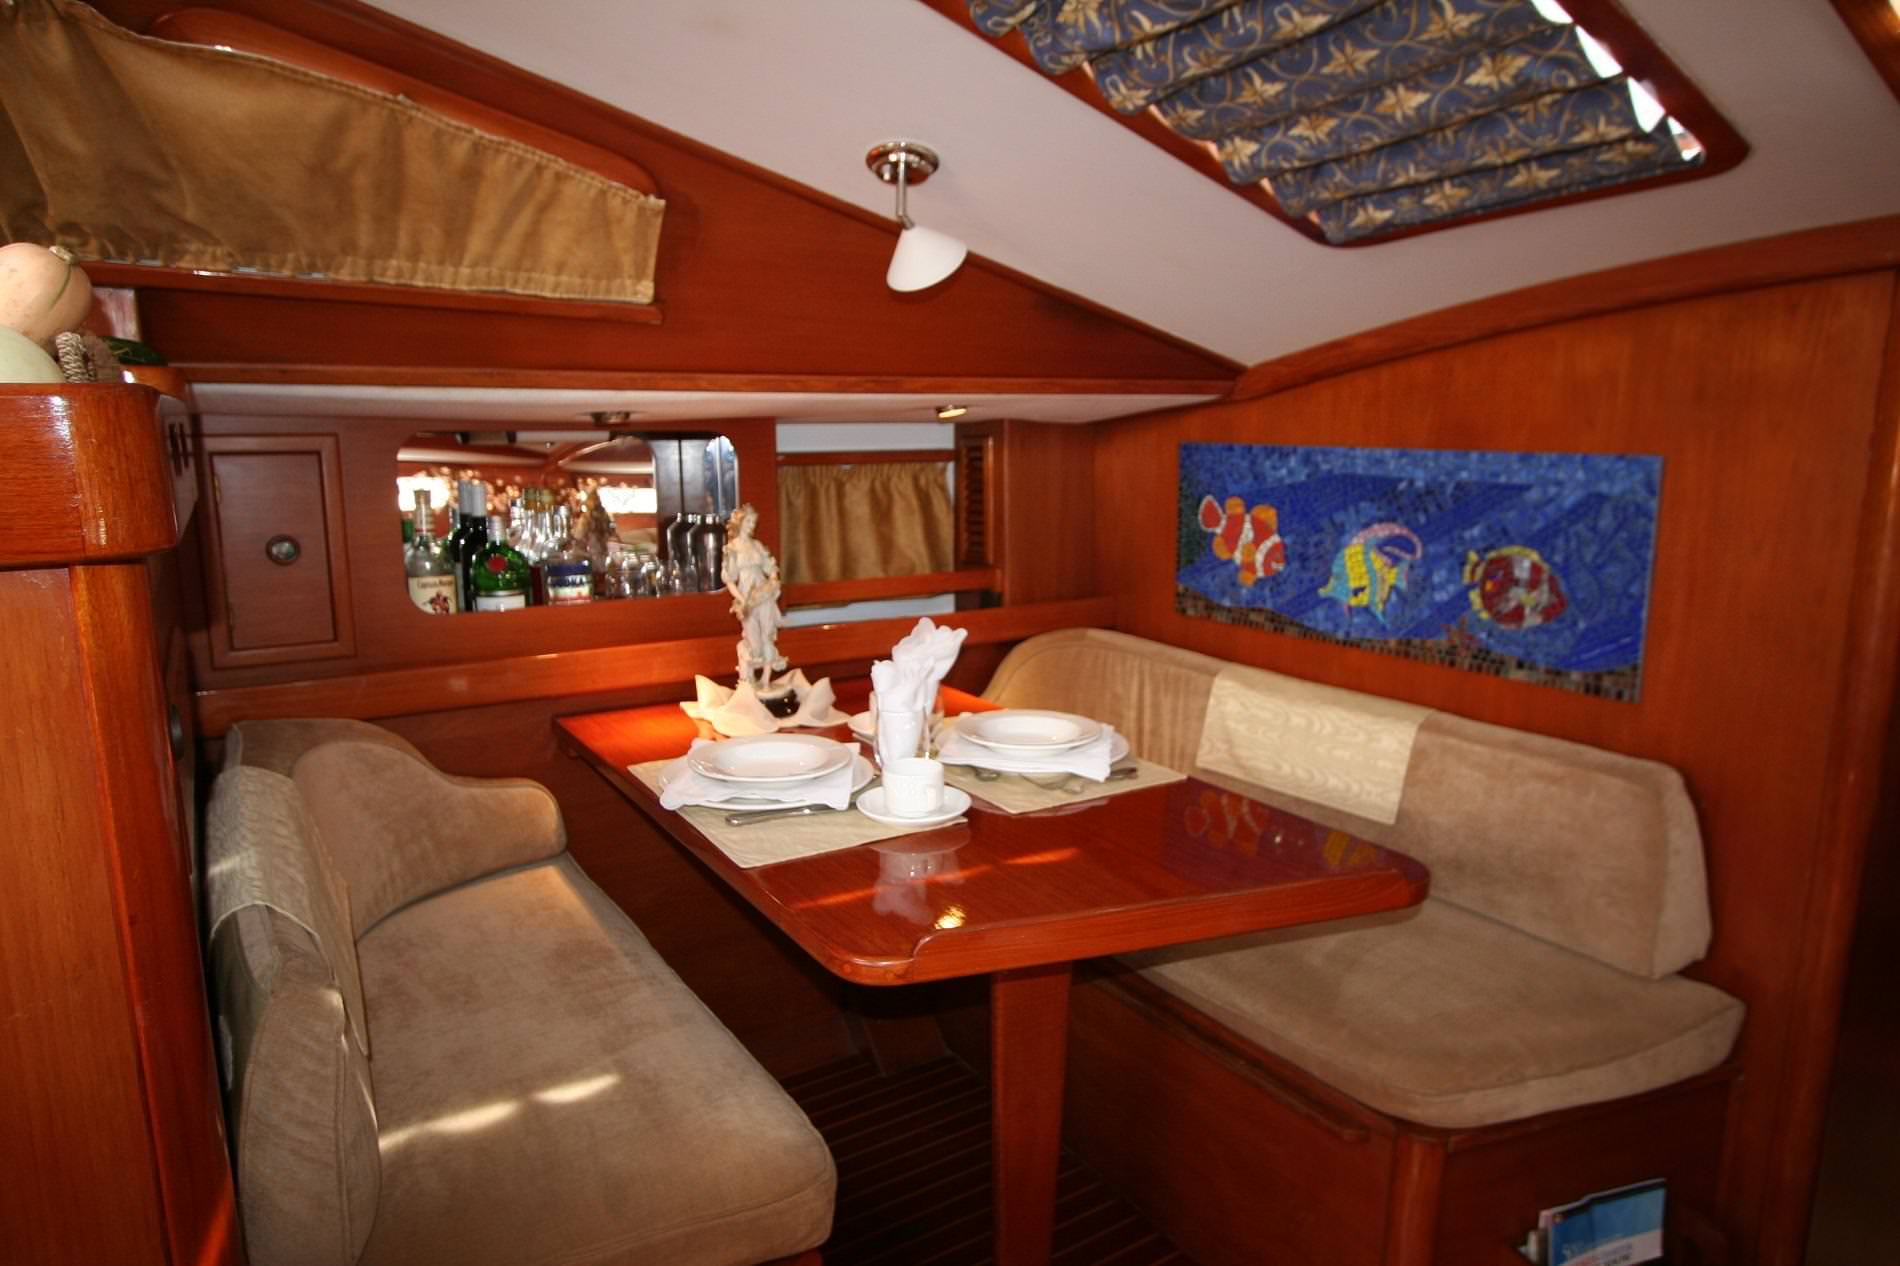 Sail Yacht 'Sail', 6 PAX, 2 Crew, 62.00 Ft, 18.00 Meters, Built 1991, Dynamique Ya, Refit Year 2019